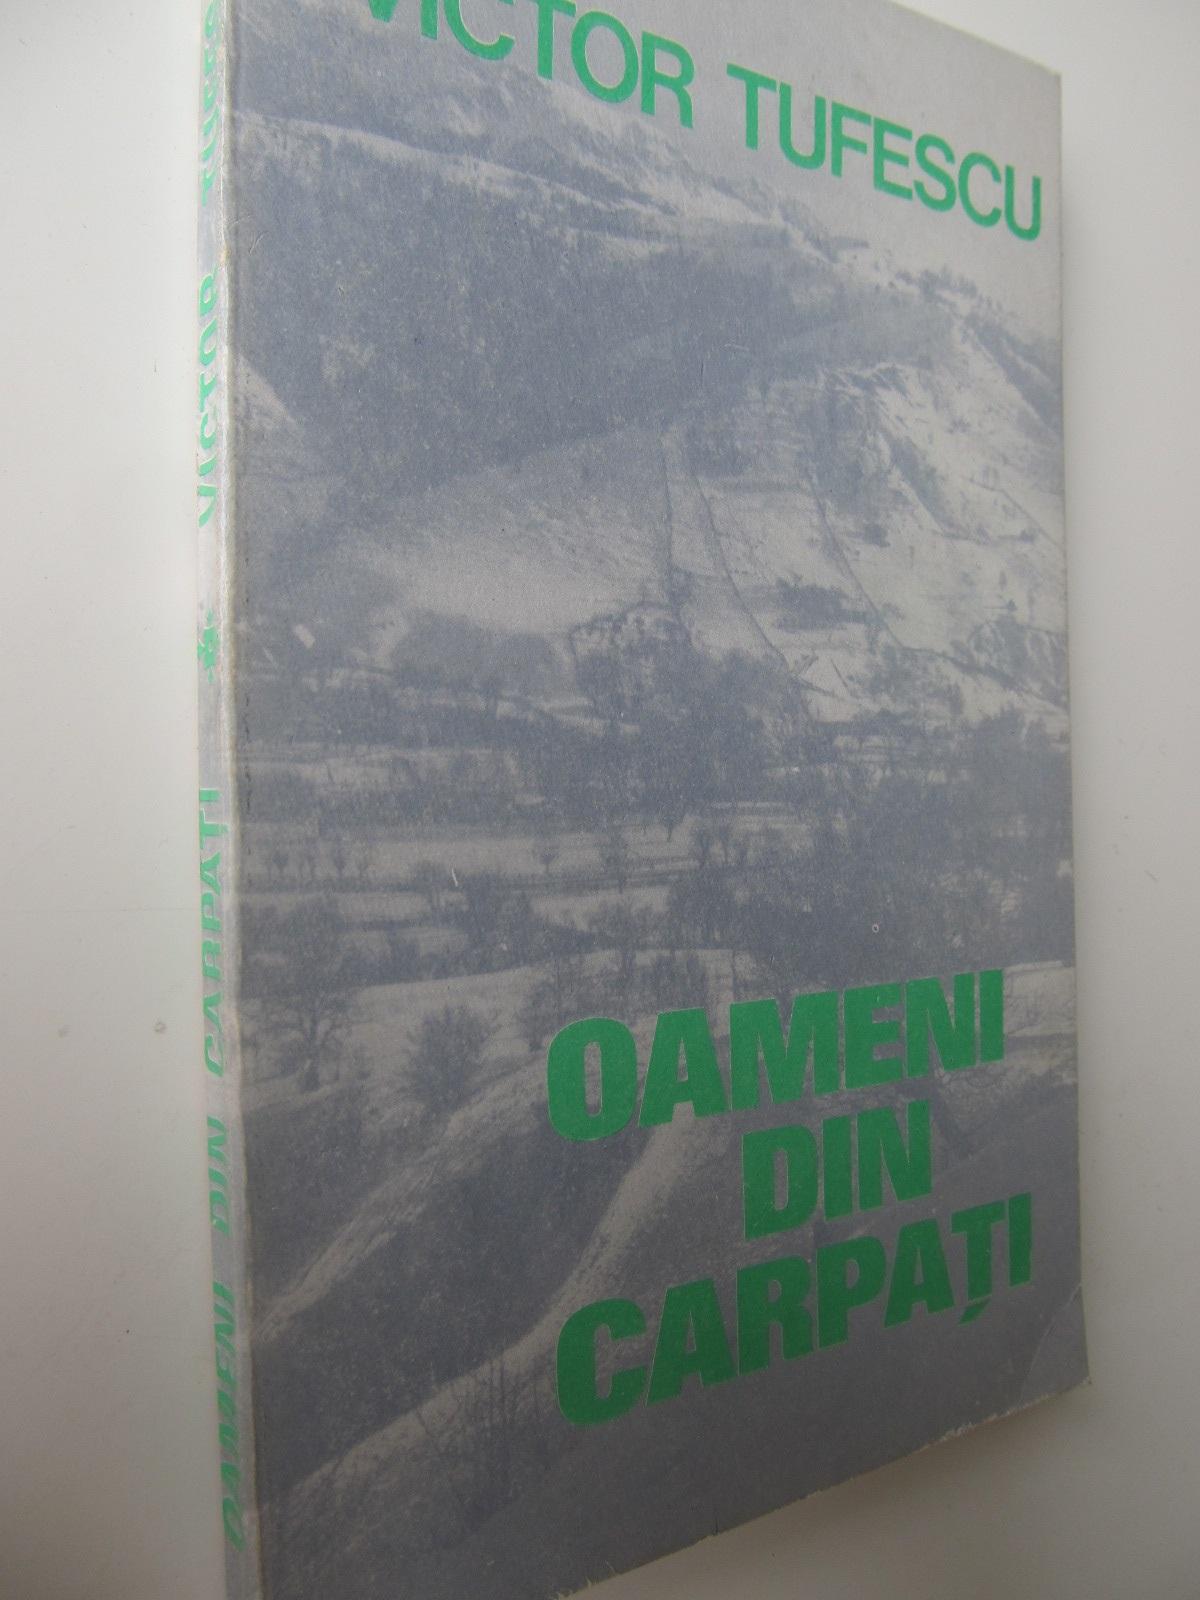 Carte Oameni din Carpati - Victor Tufescu